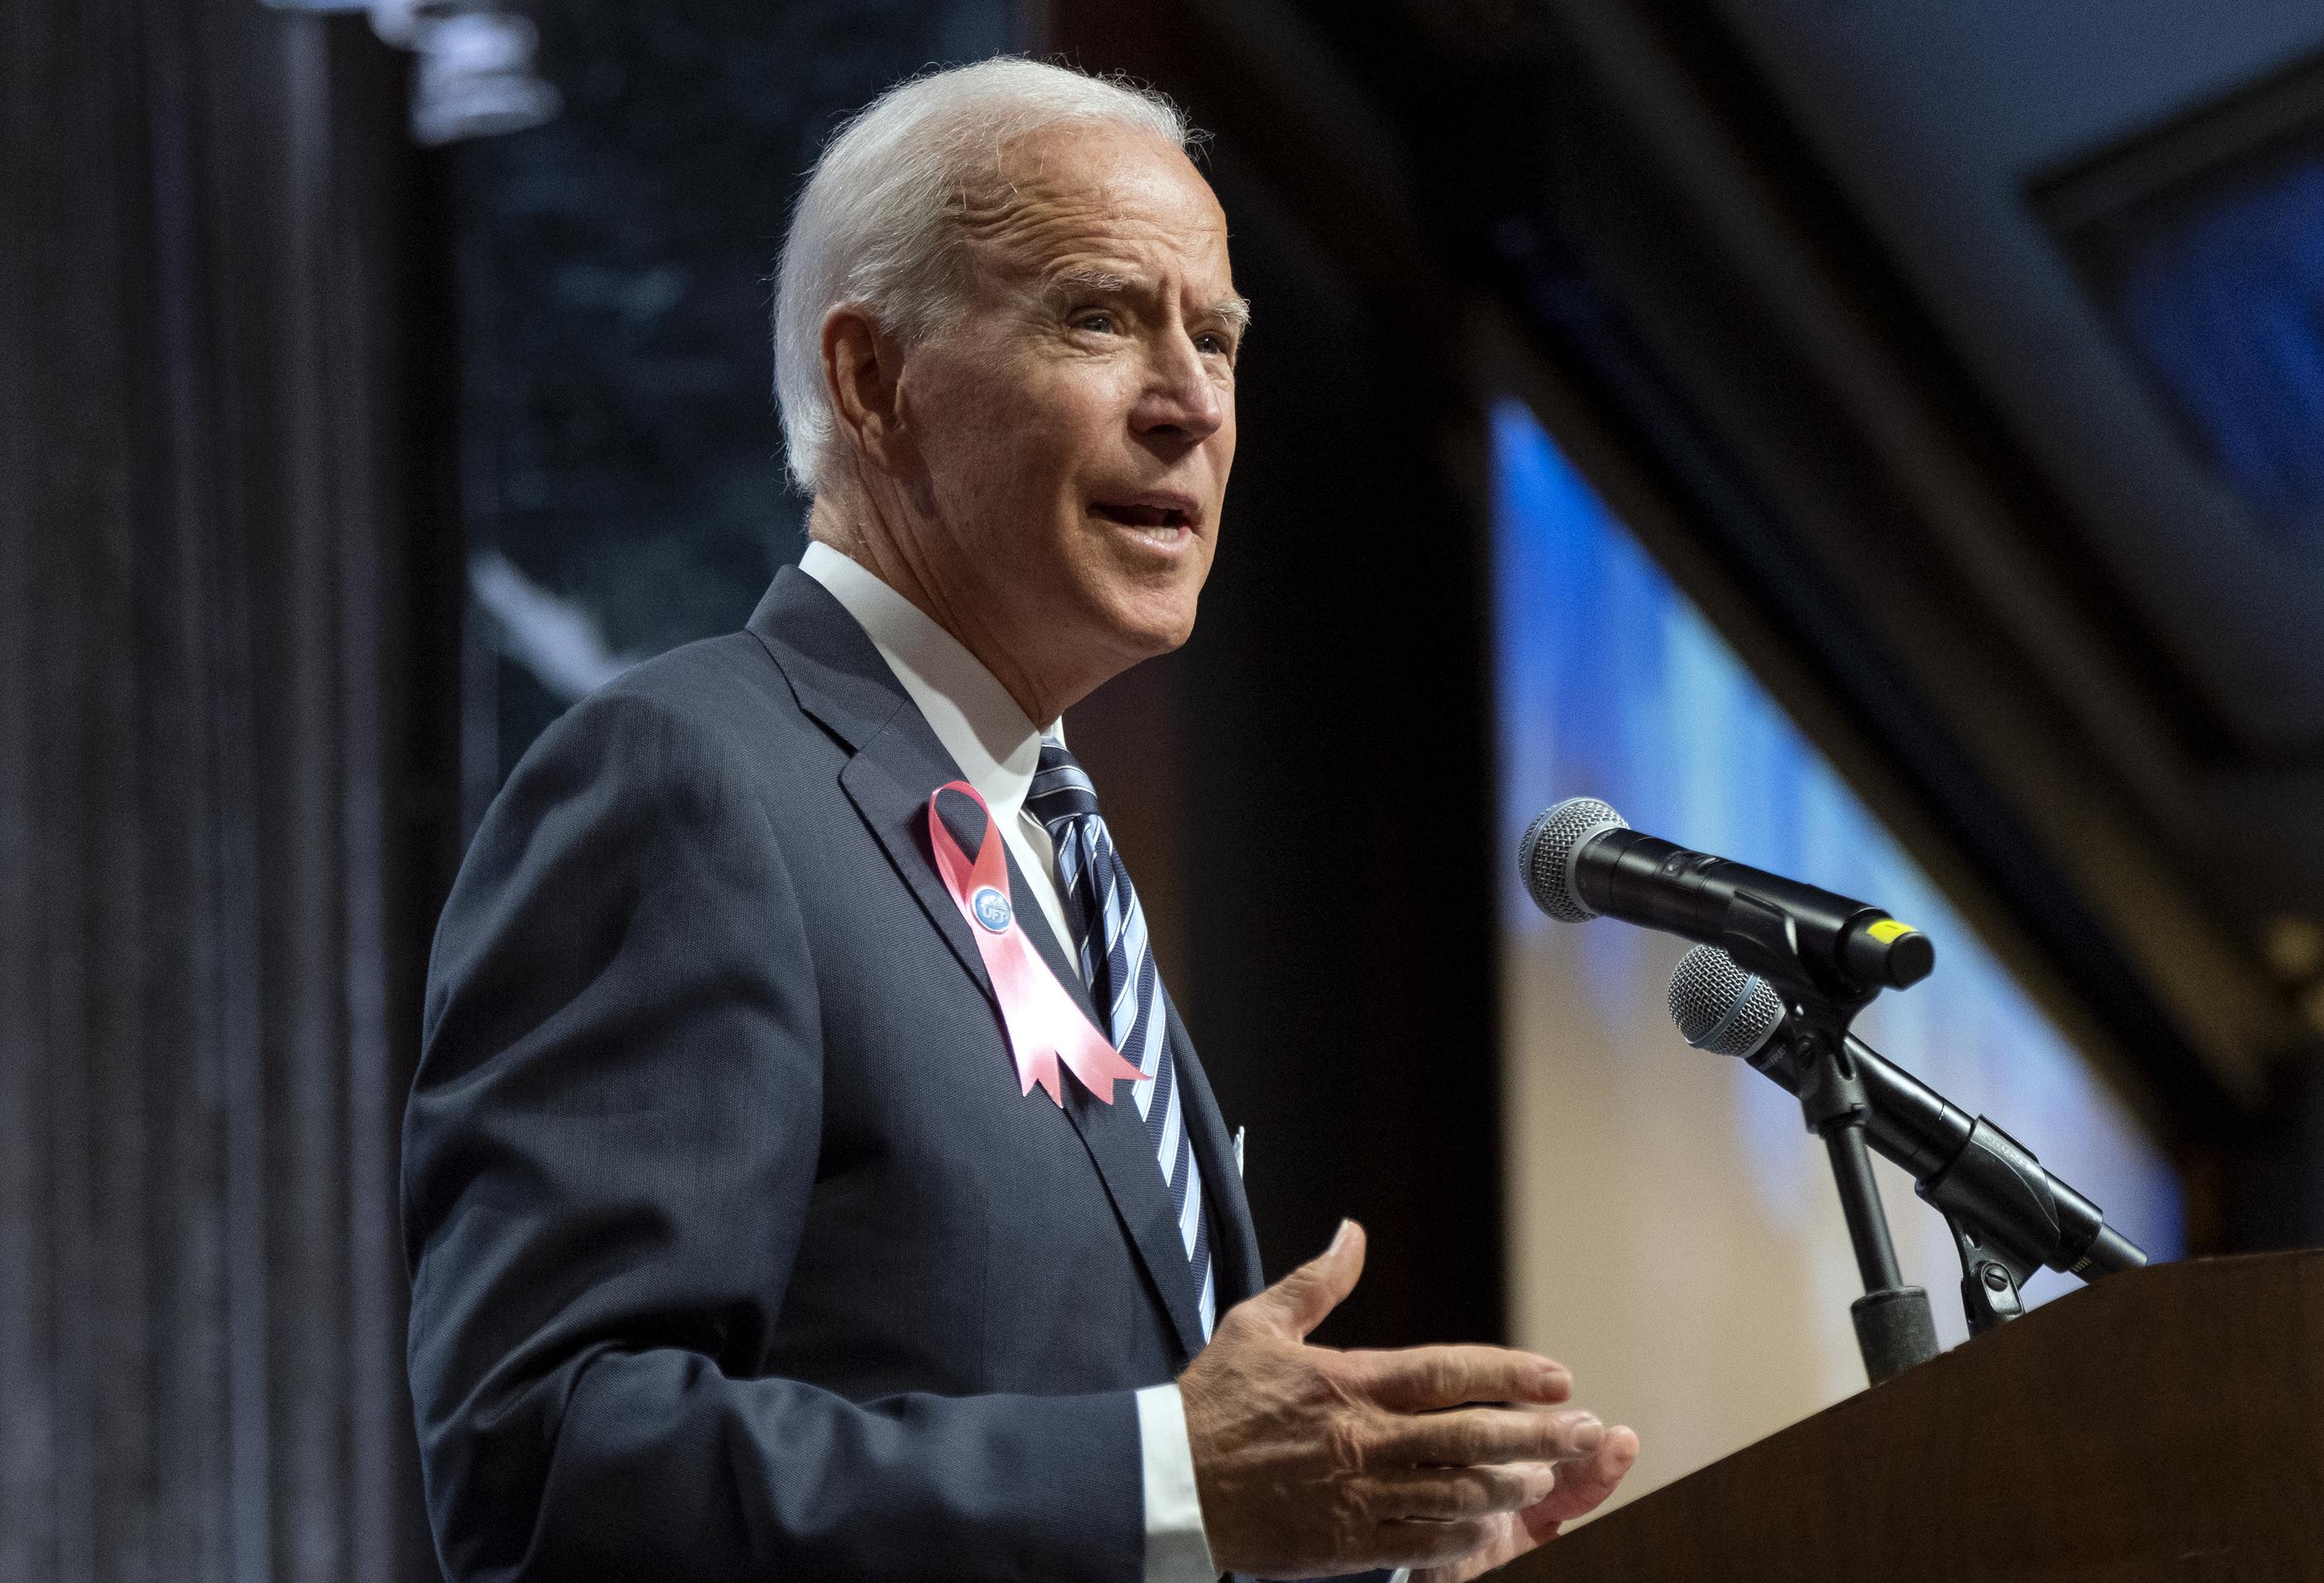 Joe Biden leads 2020 Democratic presidential field in post-debate poll